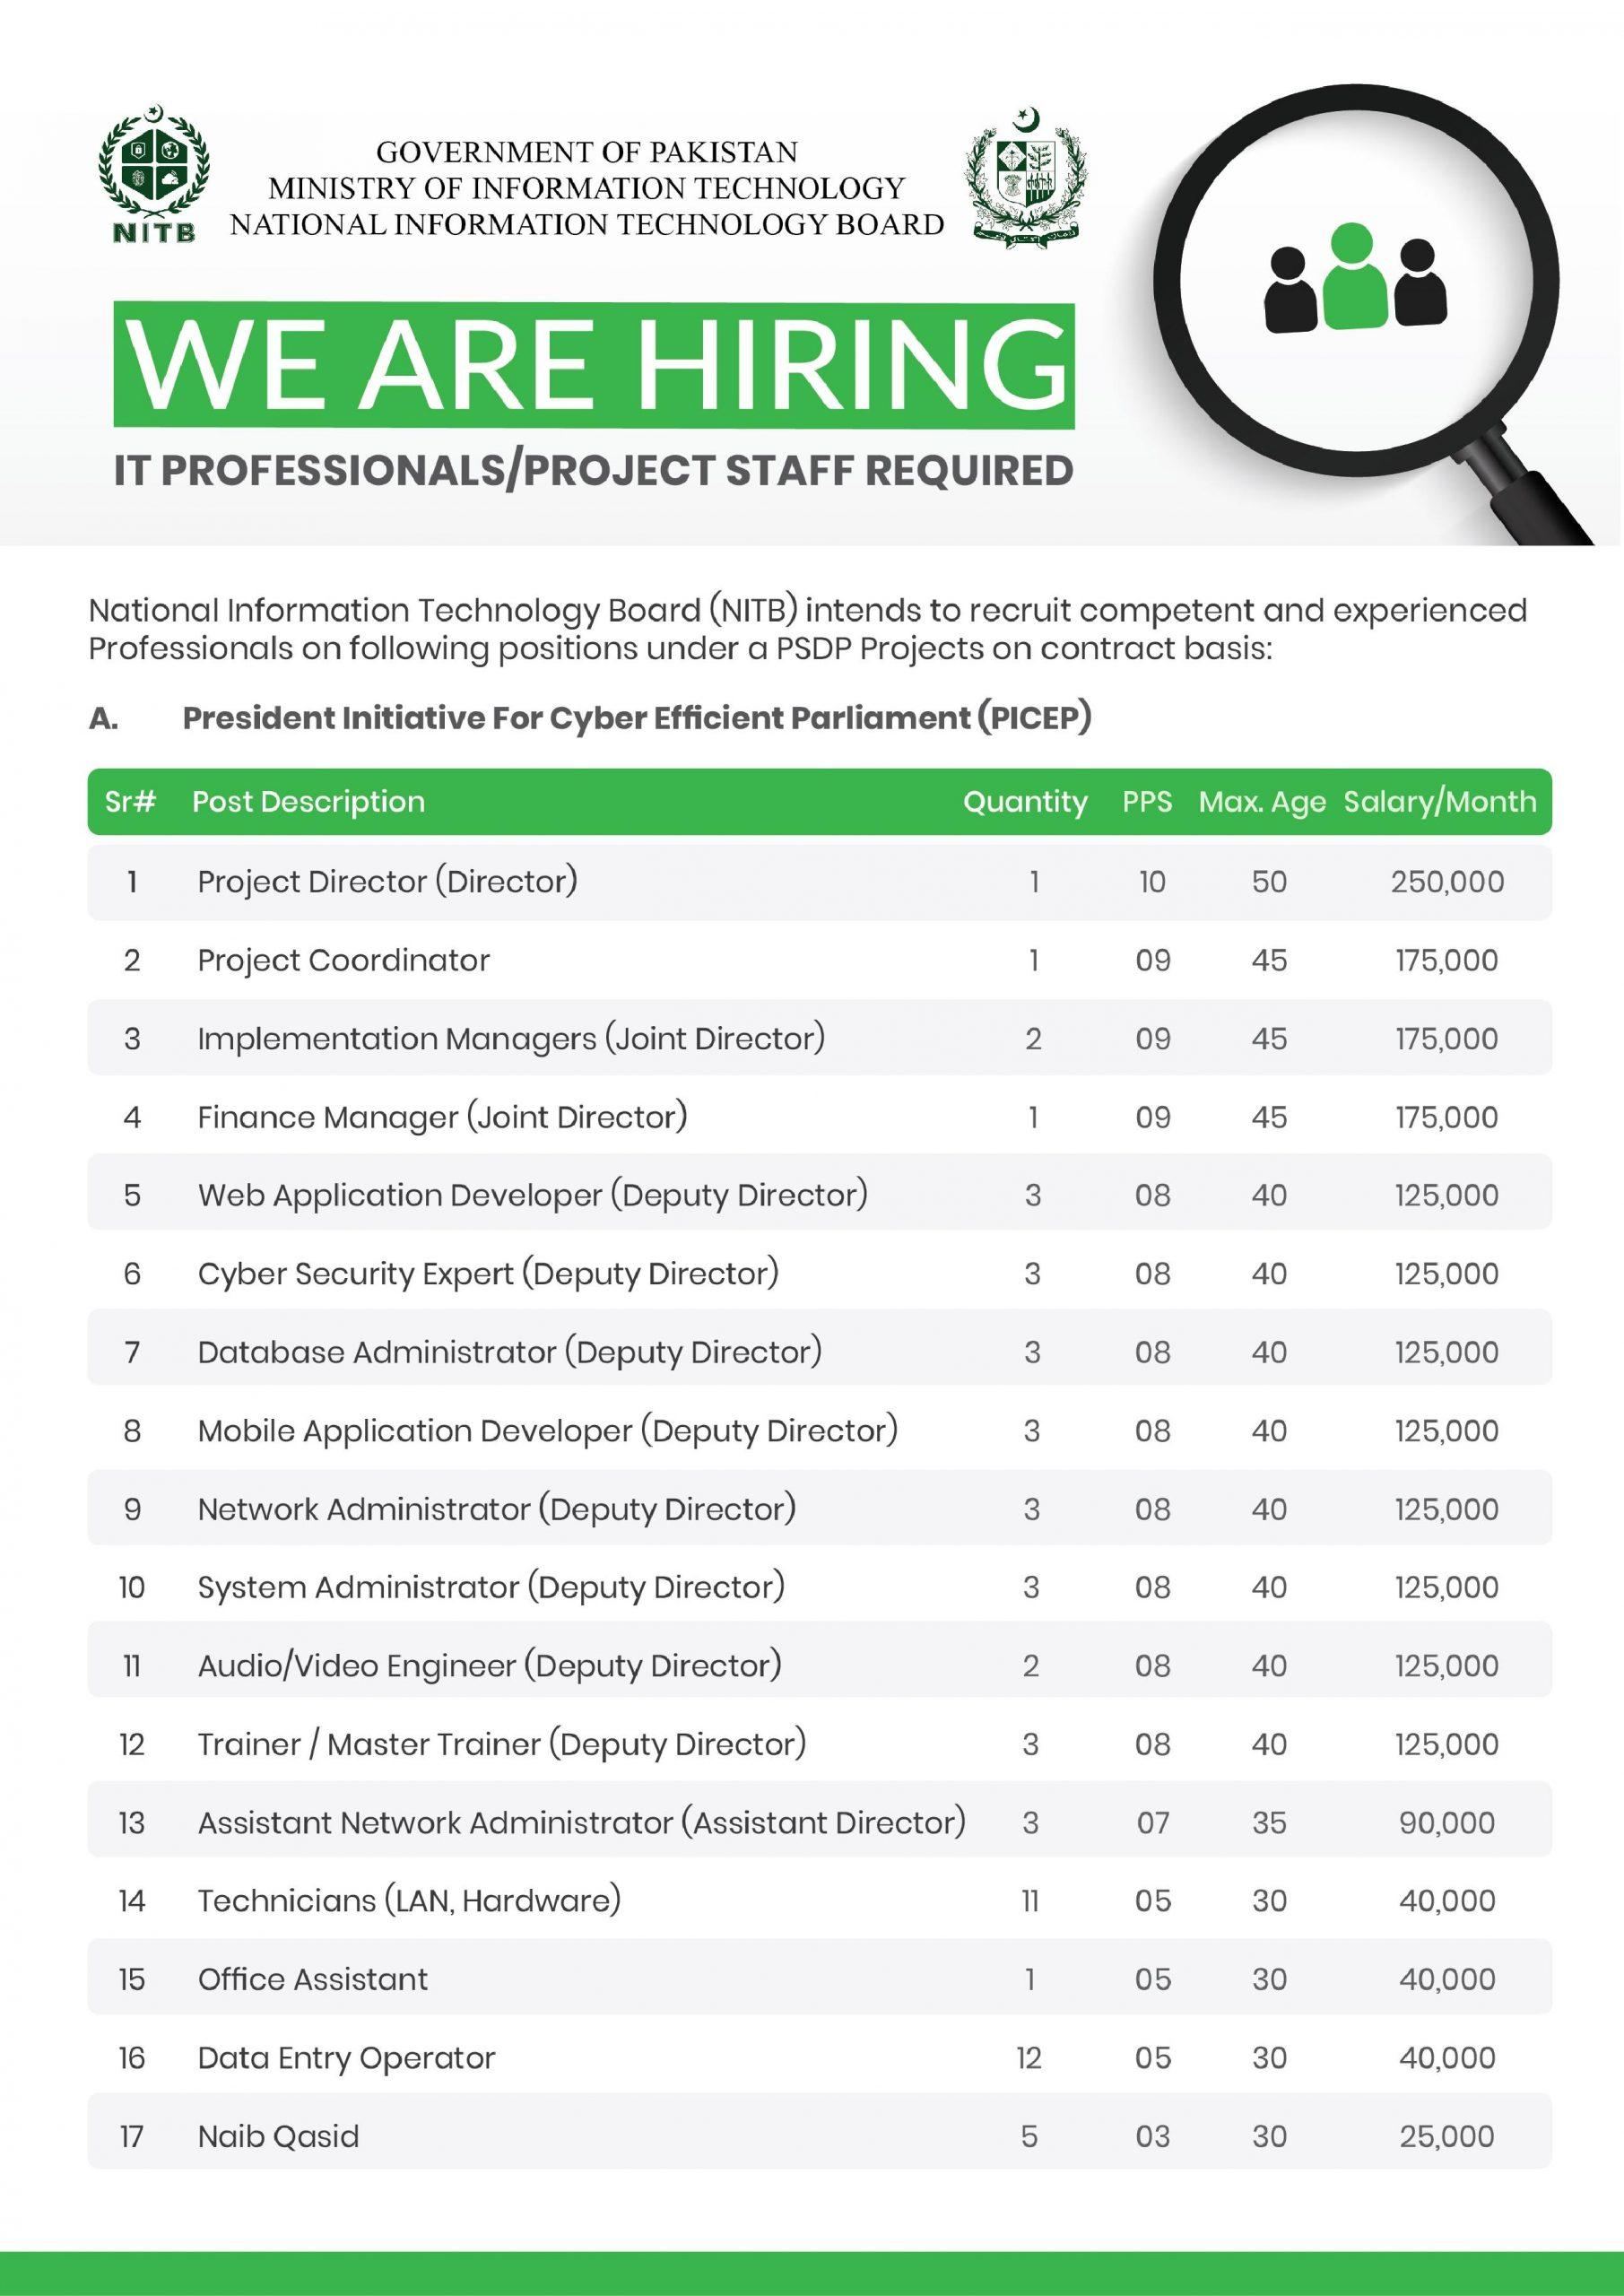 Pak govt jobs 2021 | govt jobs 2021 | govt jobs in pakistan 2021